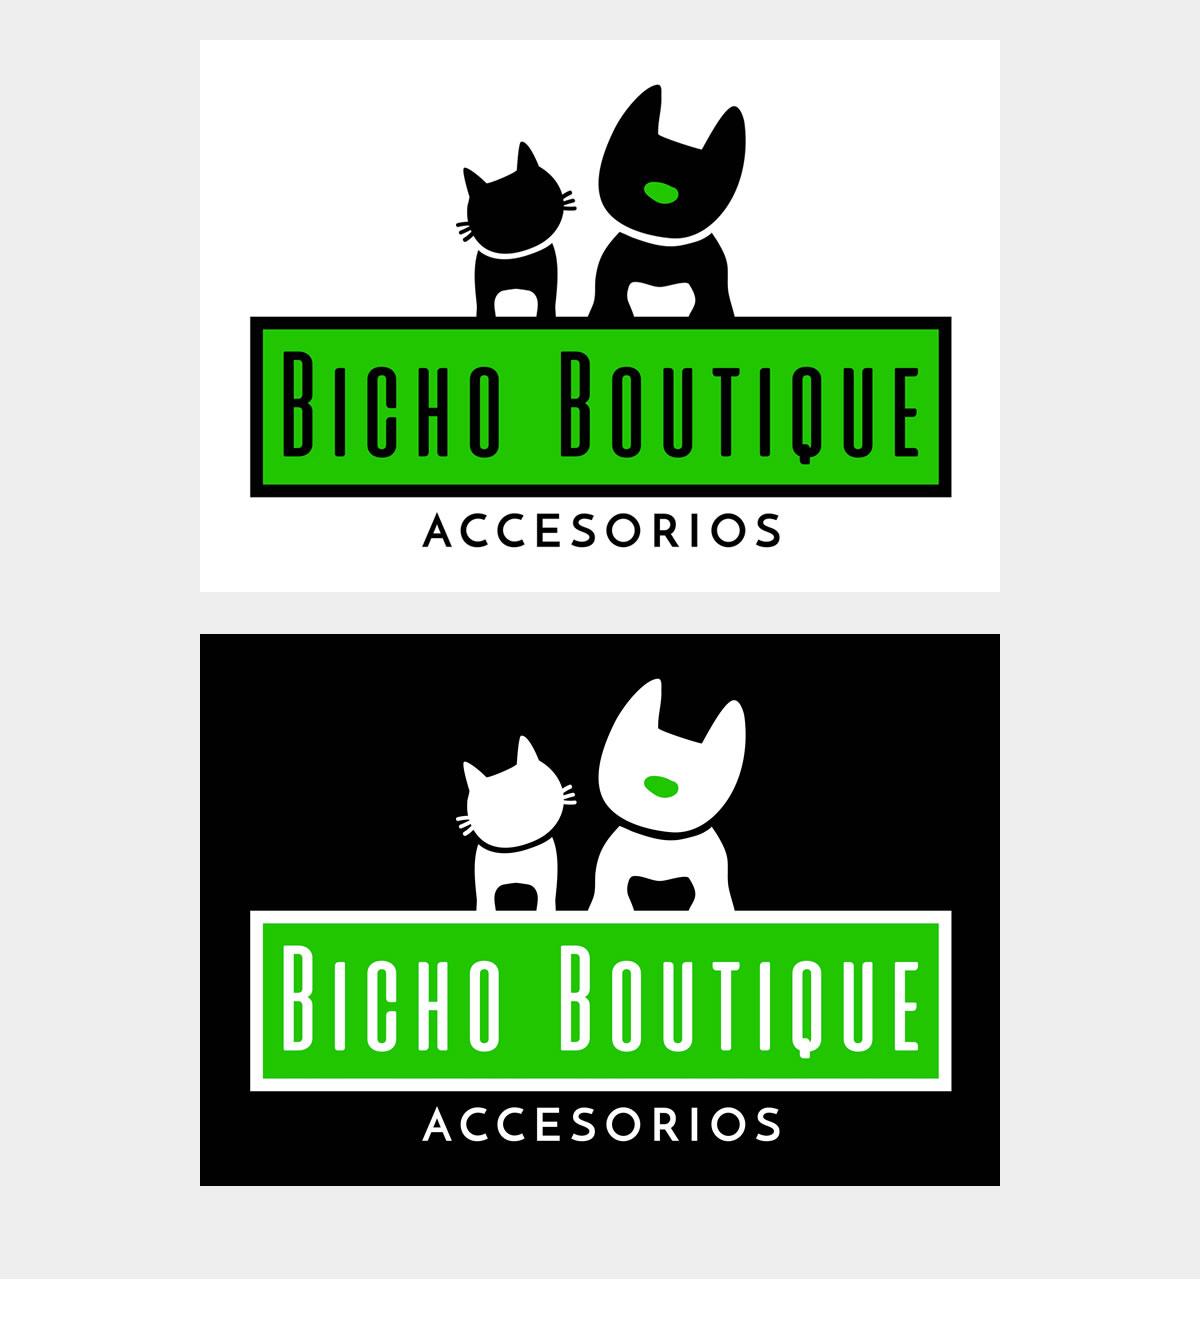 DISEÑO DE LOGO BICHO BOUTIQUE